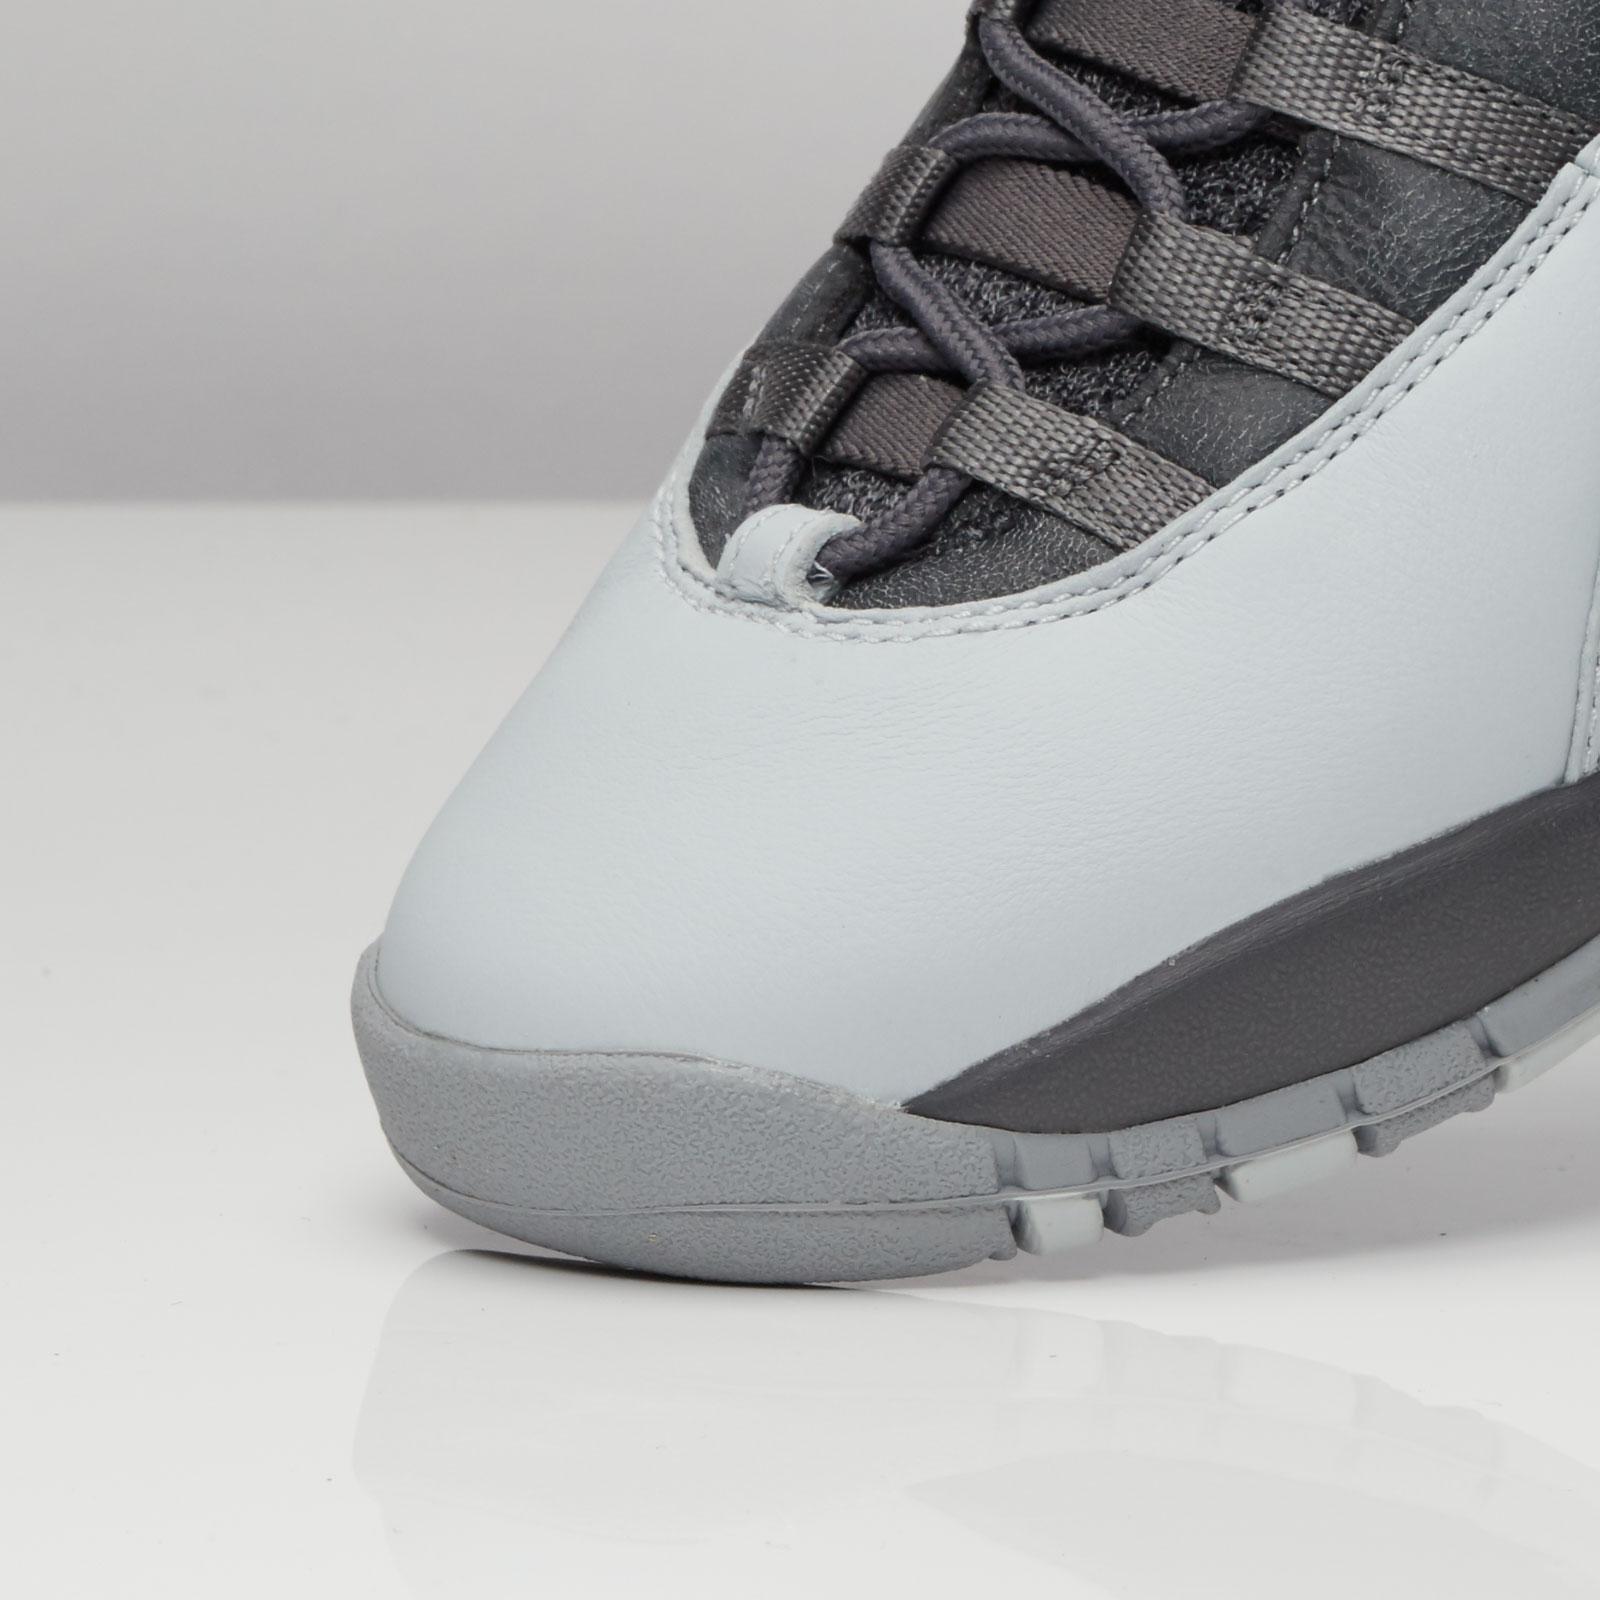 2b947415fd20 Jordan Brand Air Jordan Retro 10 (GS) - 310806-004 - Sneakersnstuff ...